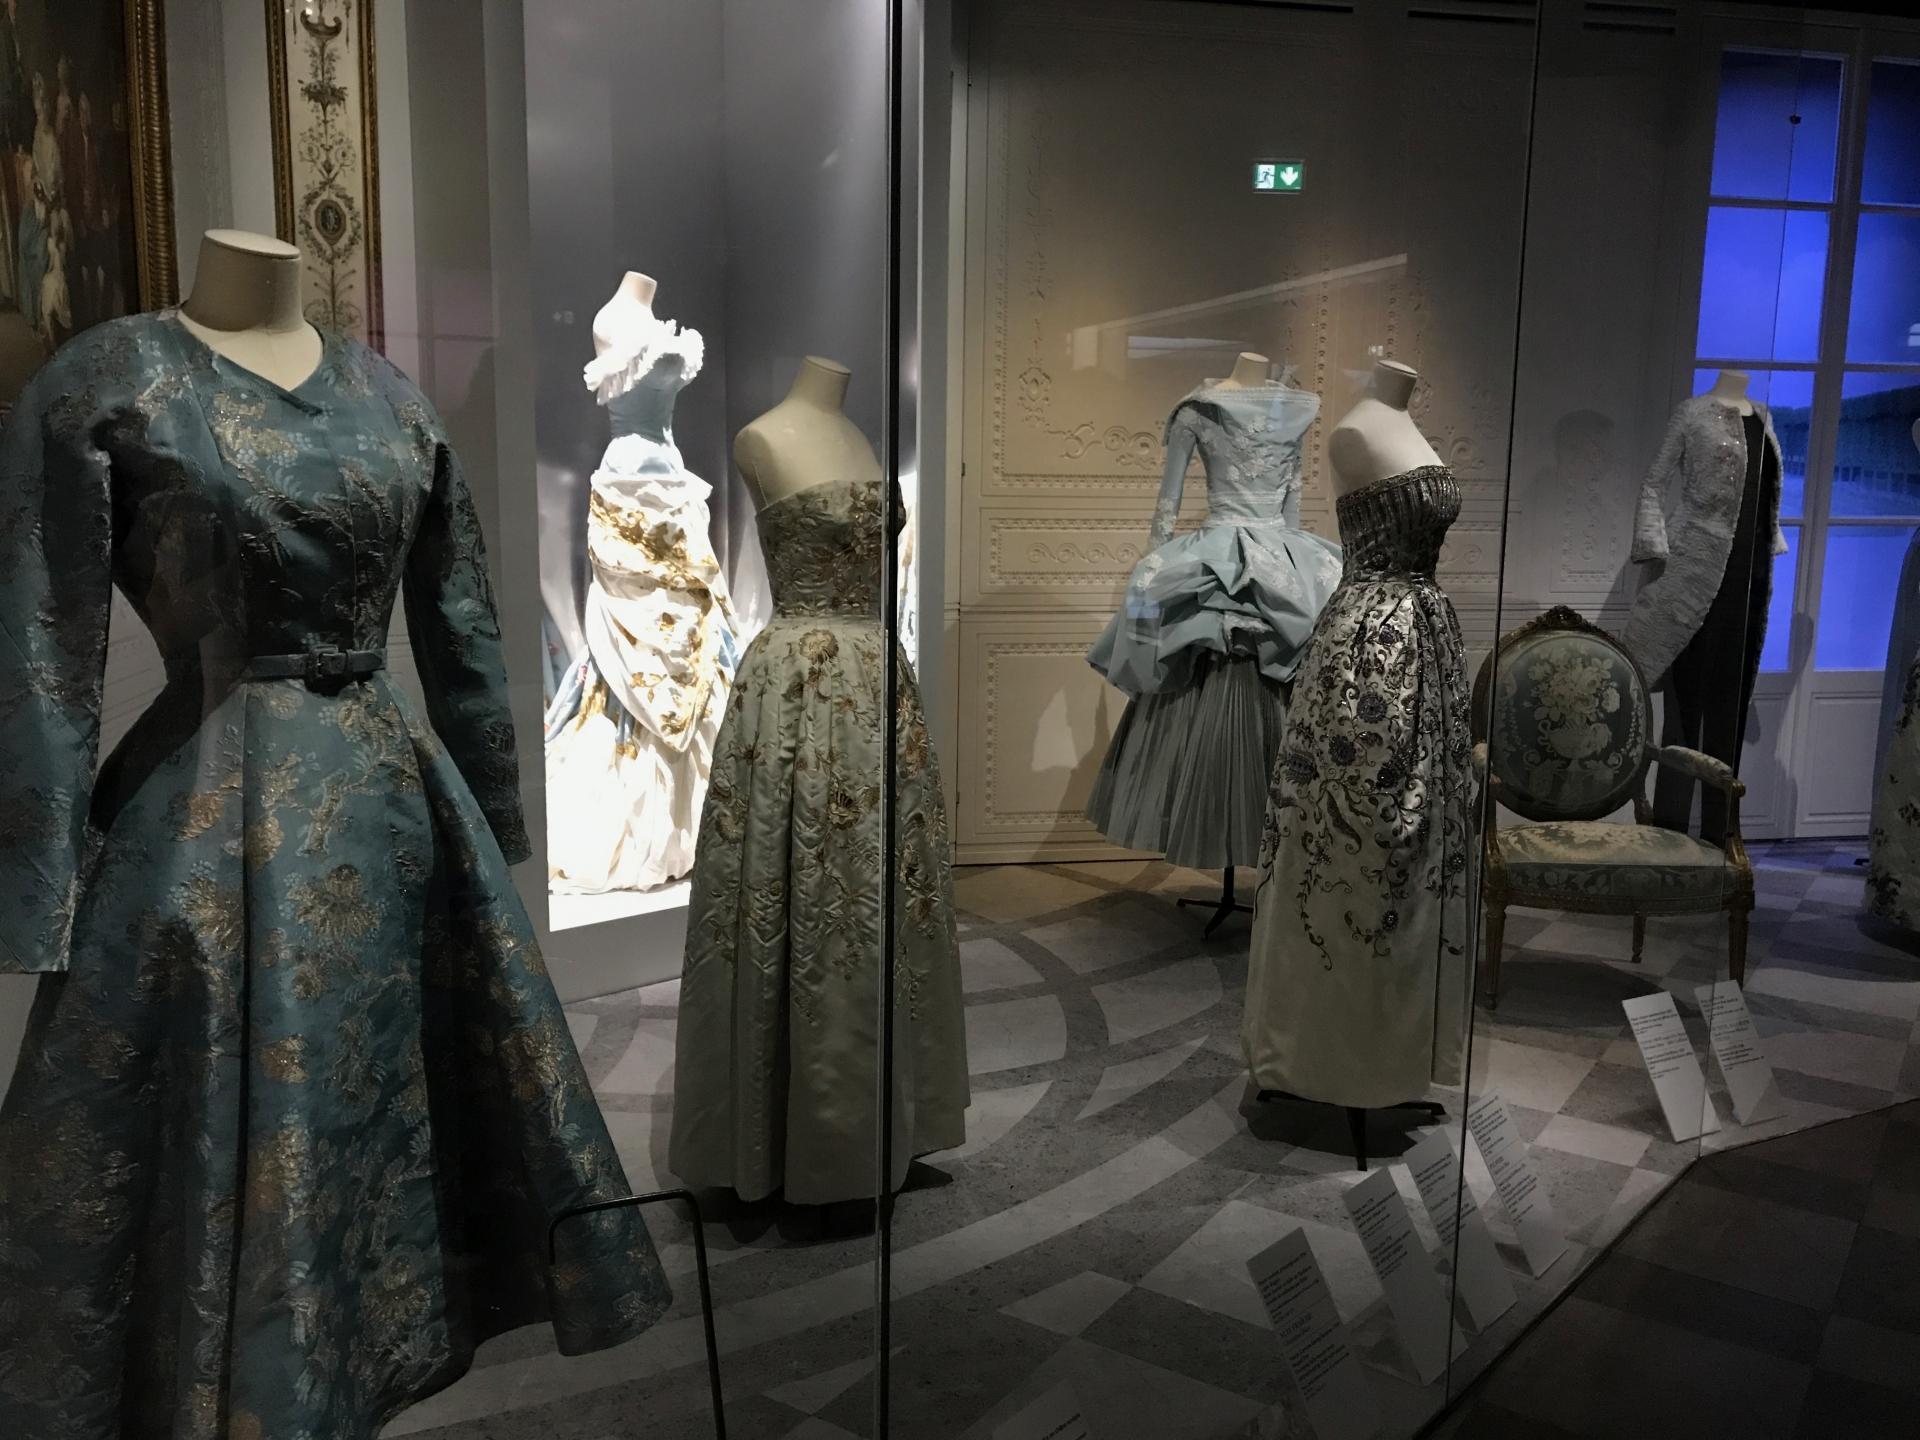 Dior Exhibit Musee des arts décoratifs